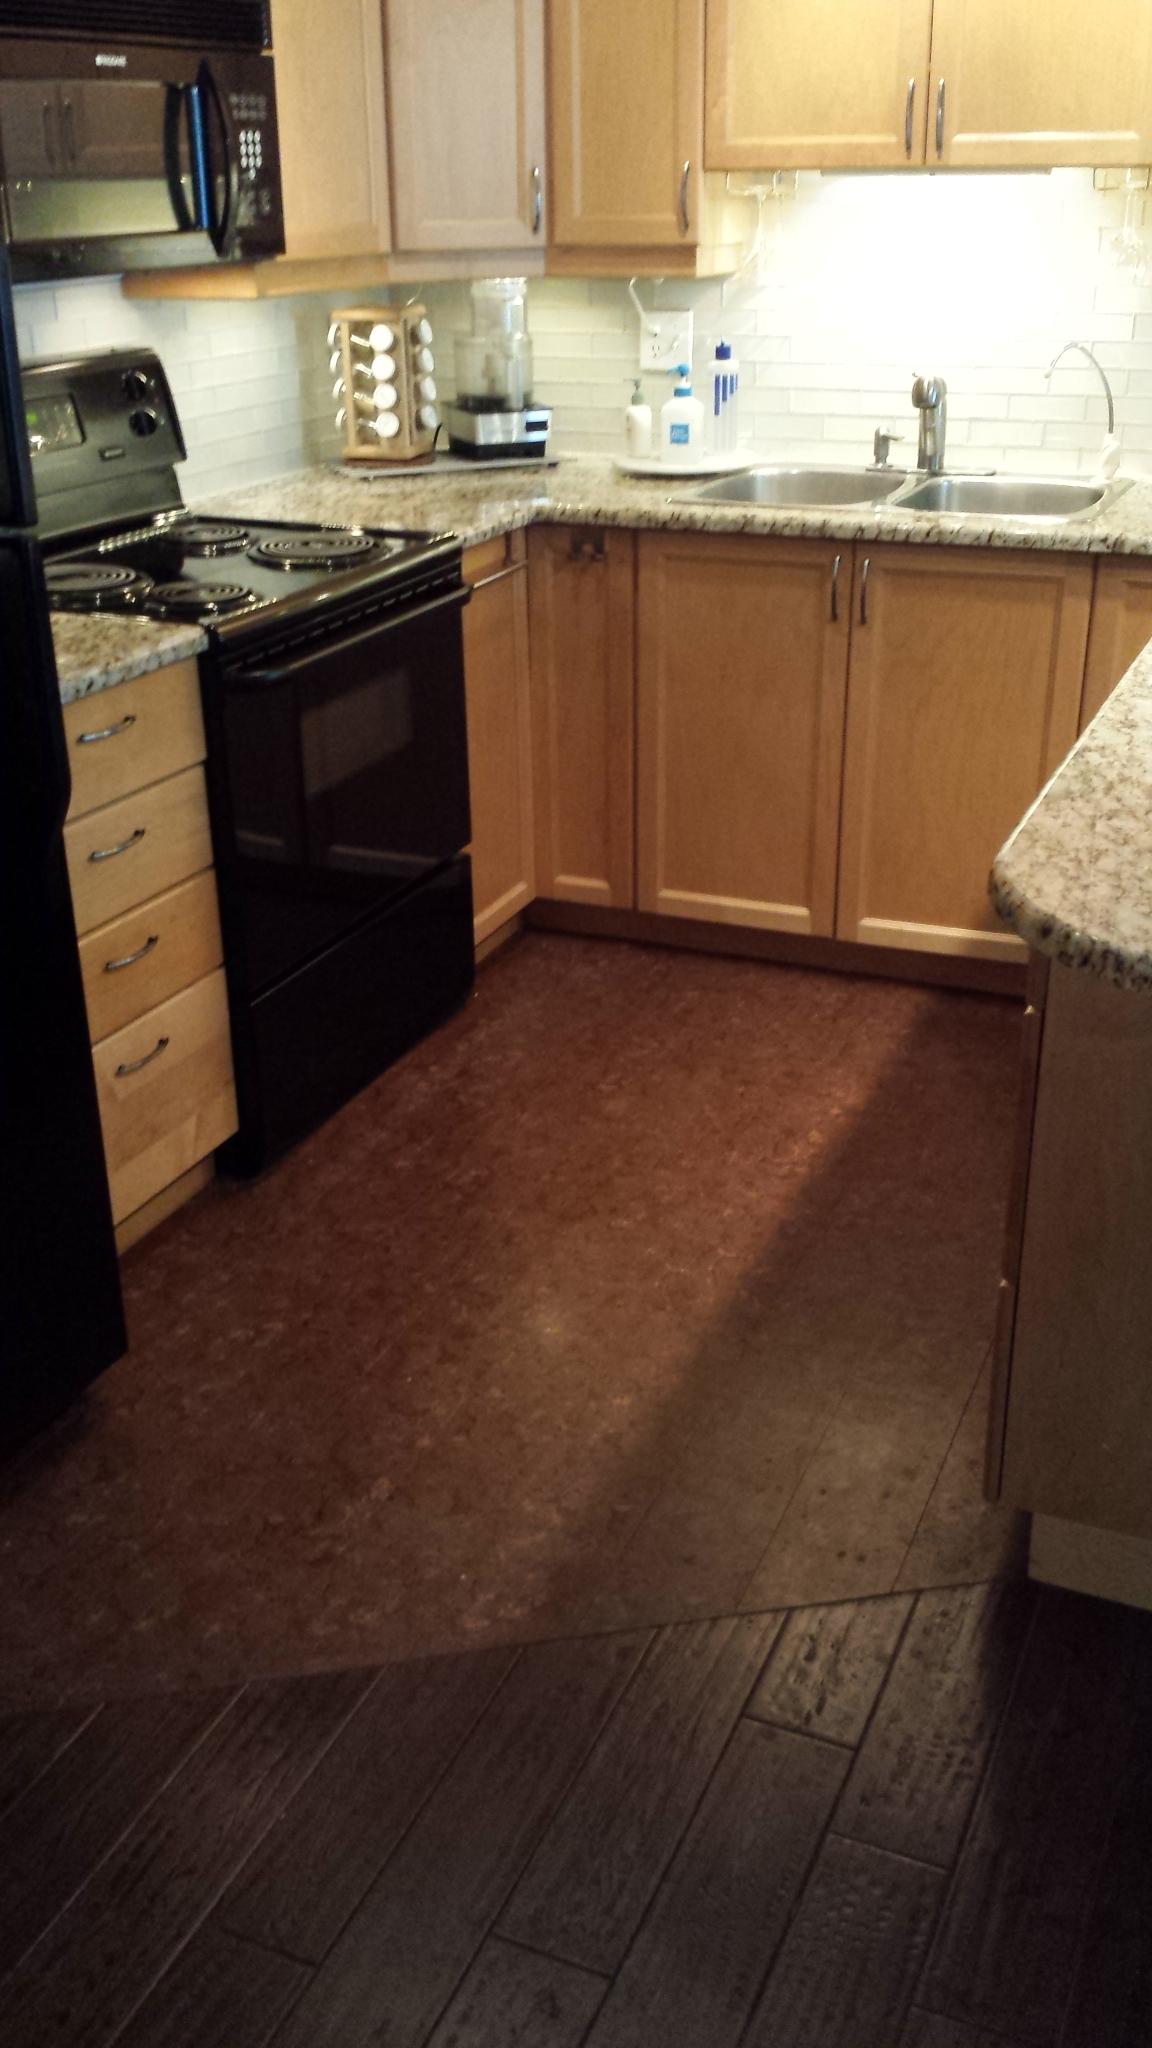 204 Kitchen Floor 4